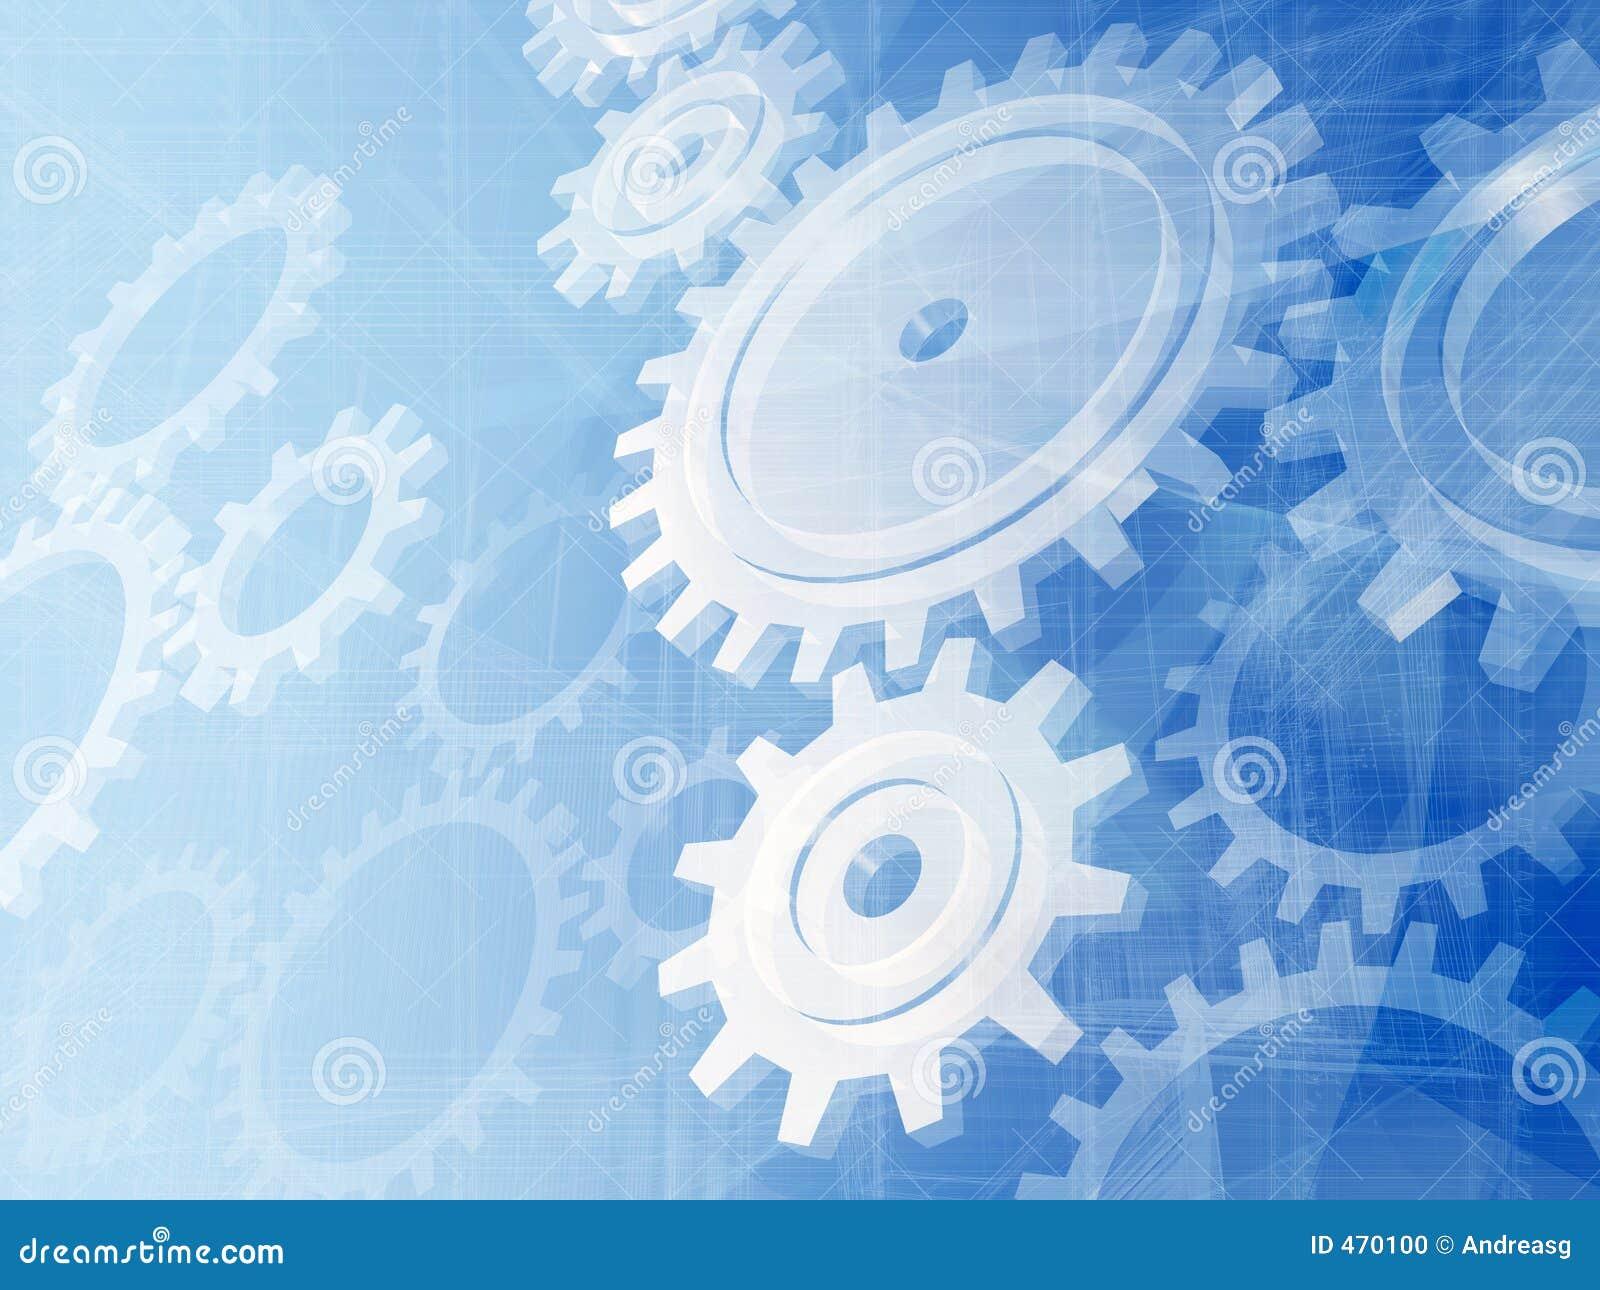 Mechanical engineering backgrounds